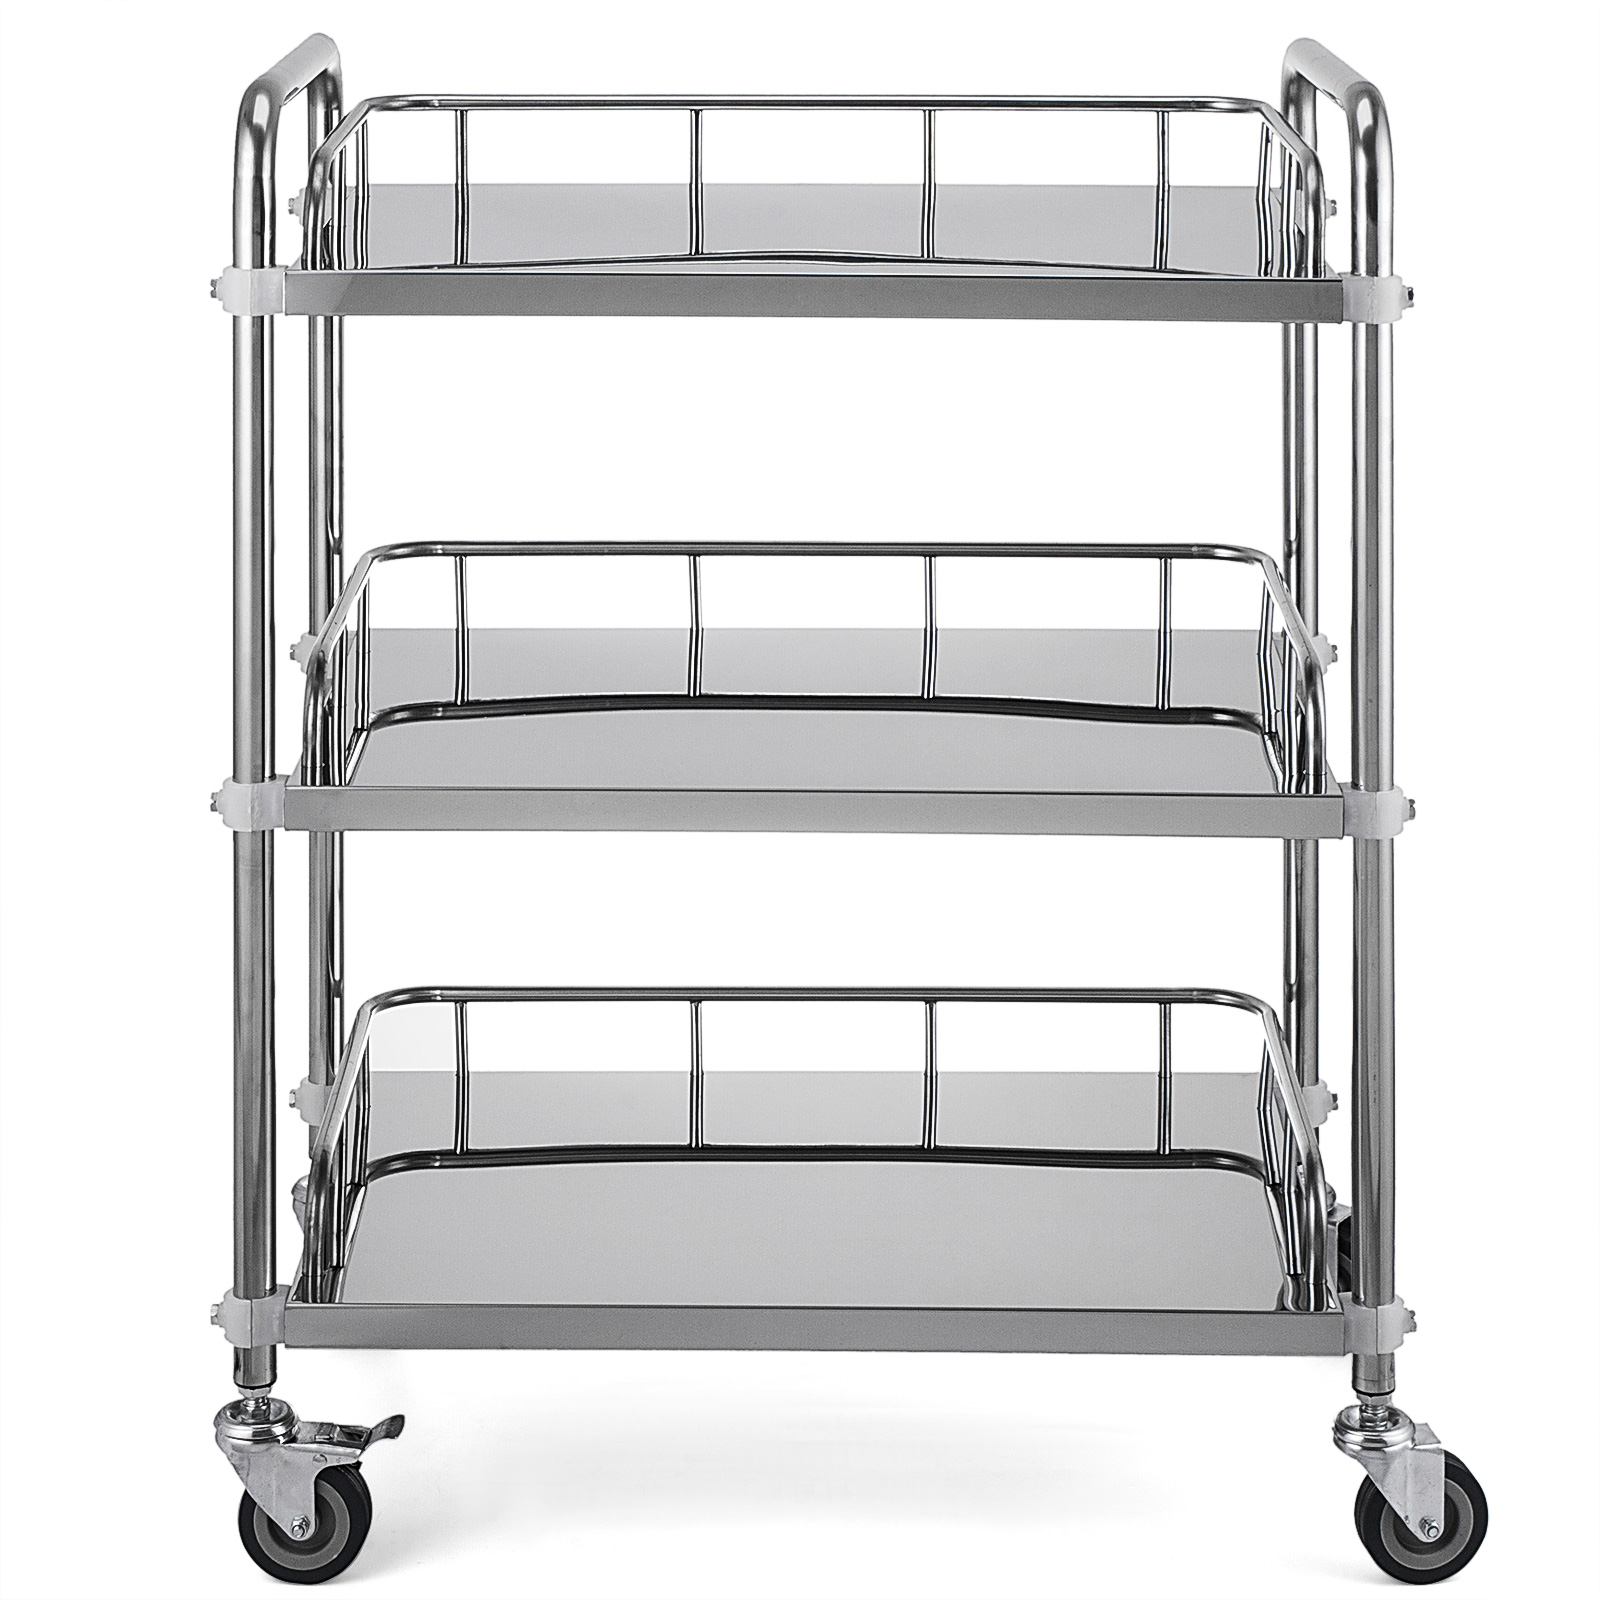 thumbnail 51 - Rolling Storage Cart Medical Salon Trolley Pedestal Rolling Cart Stainless Steel